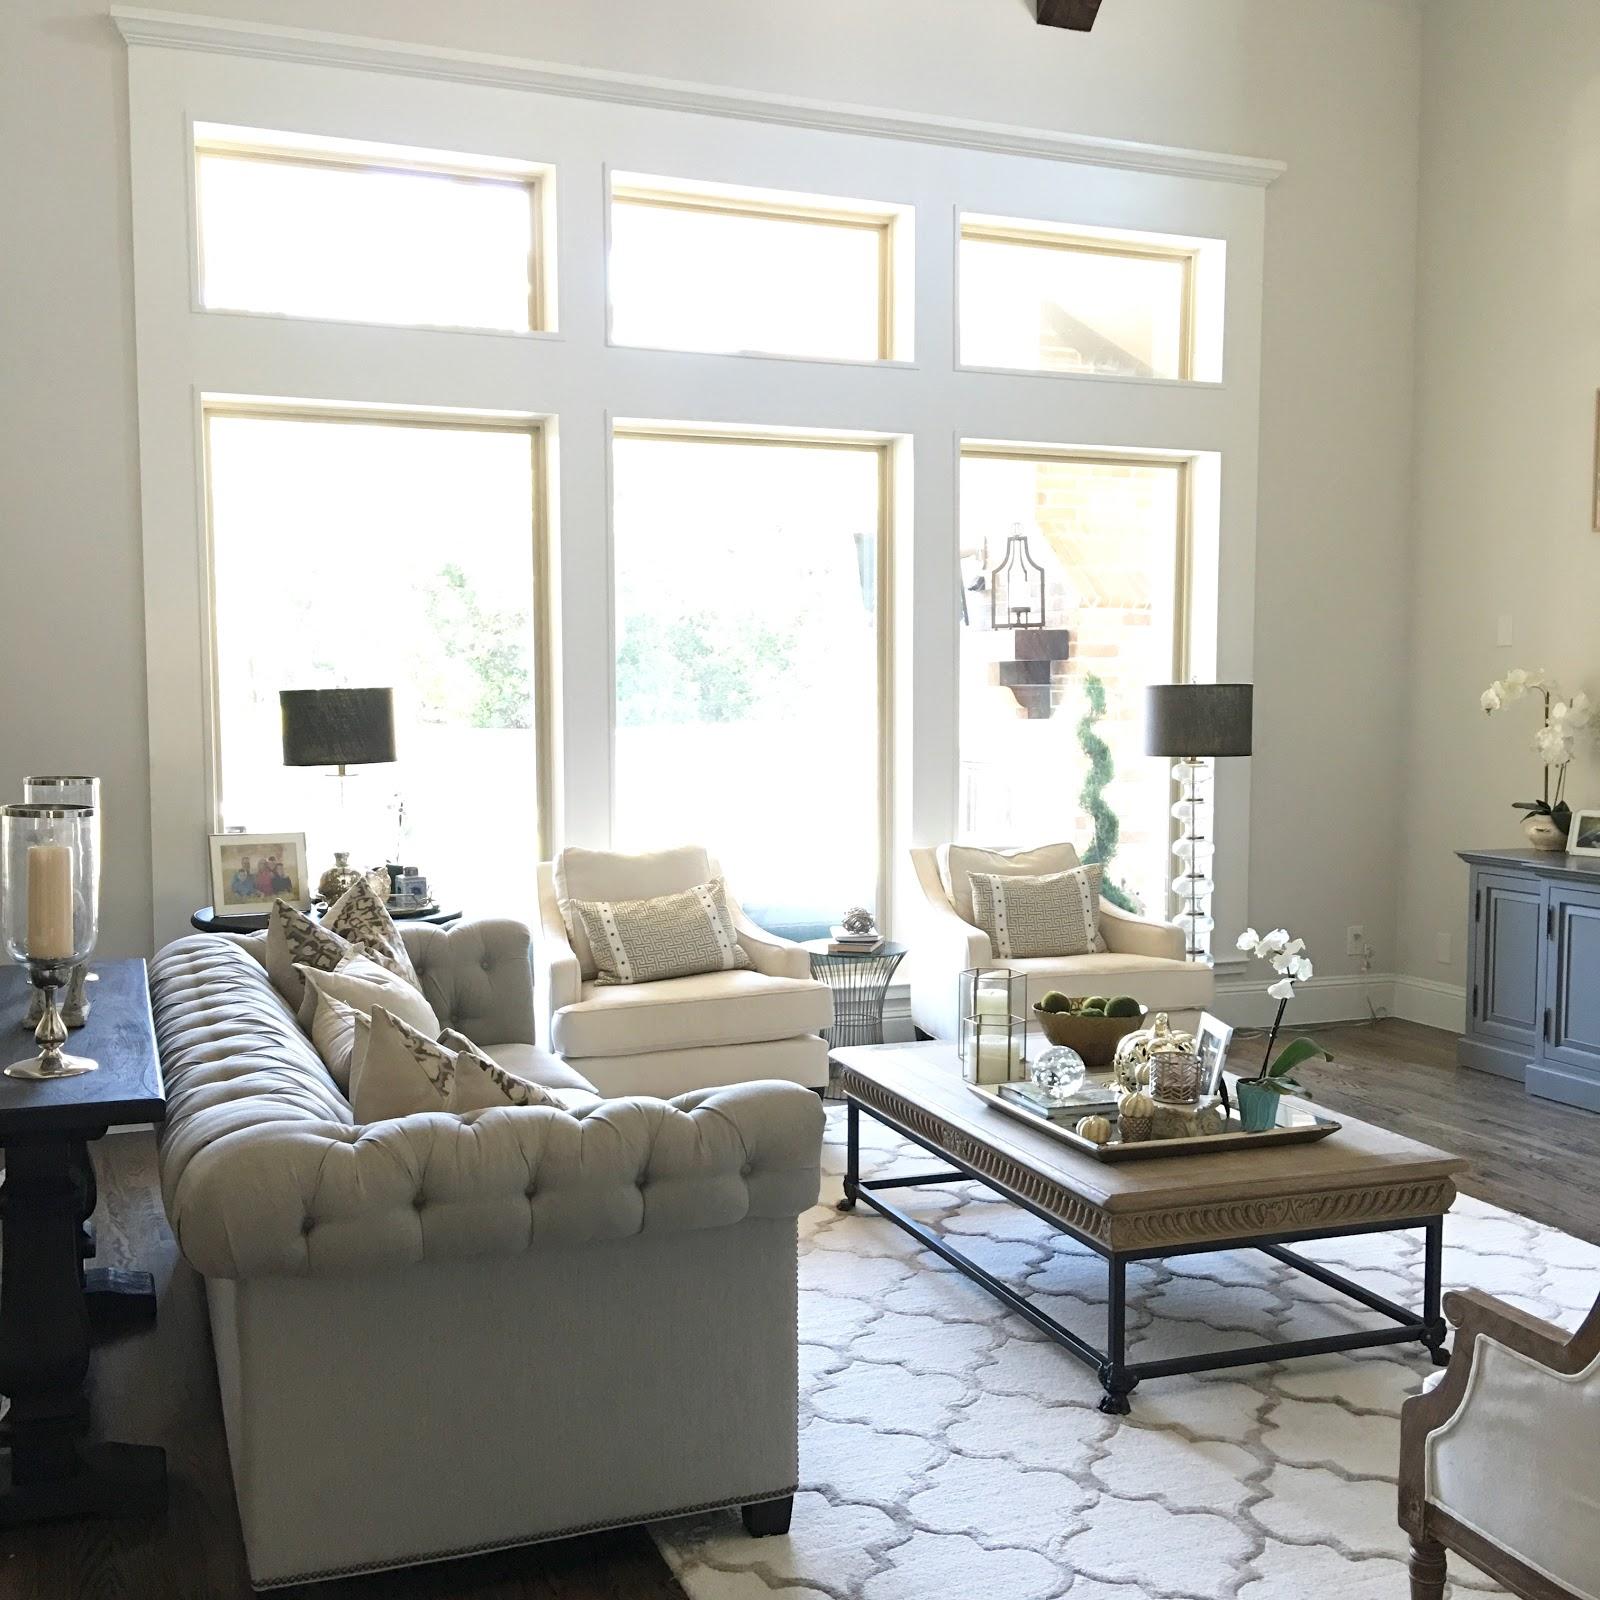 Classic Style Home: Living Room Update: DIY Window Trim